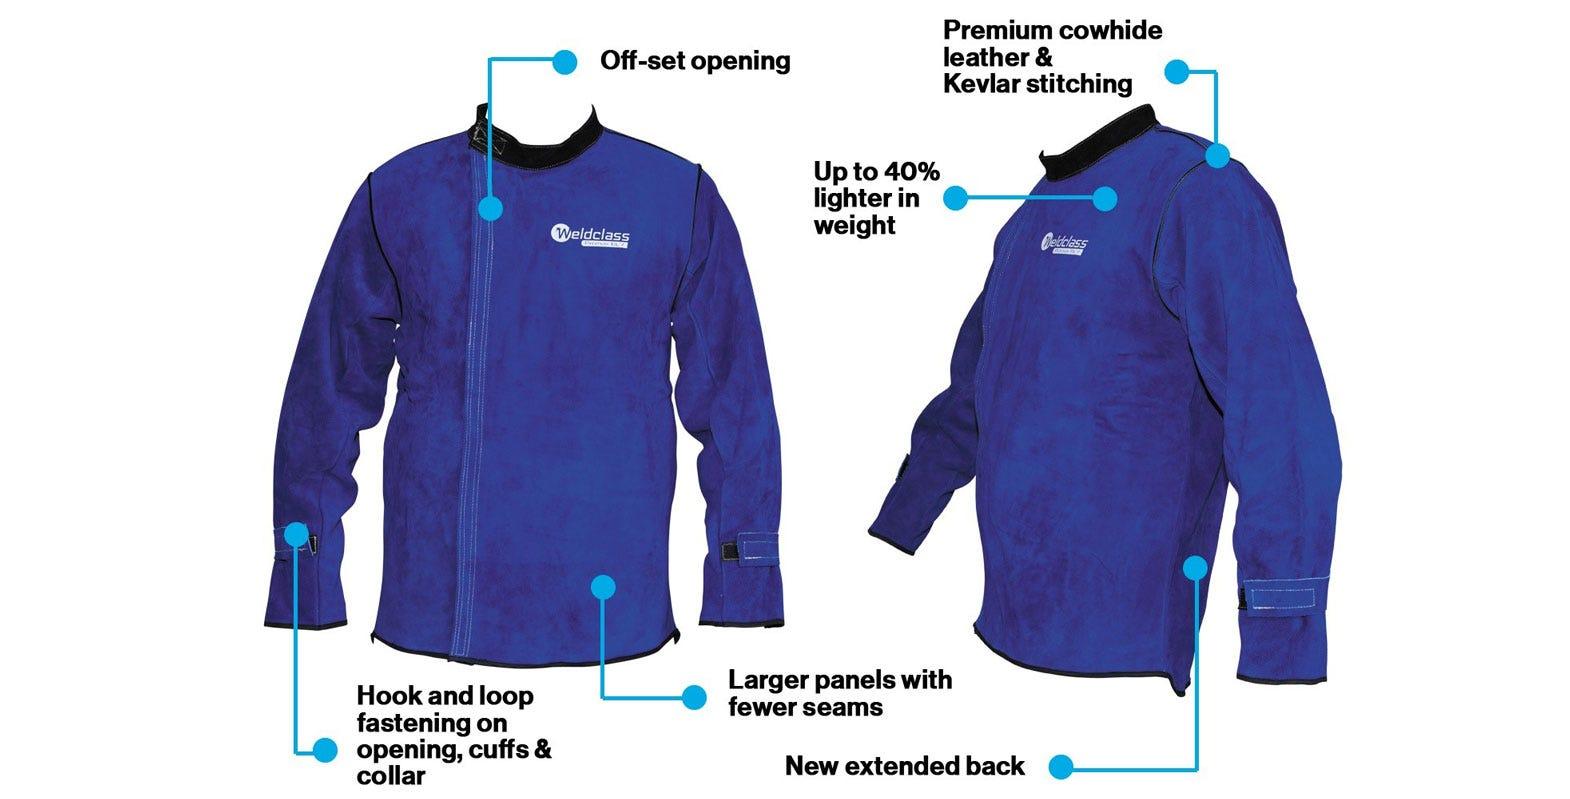 Welding jacket design upgrade - find a new level of lightweight comfort!